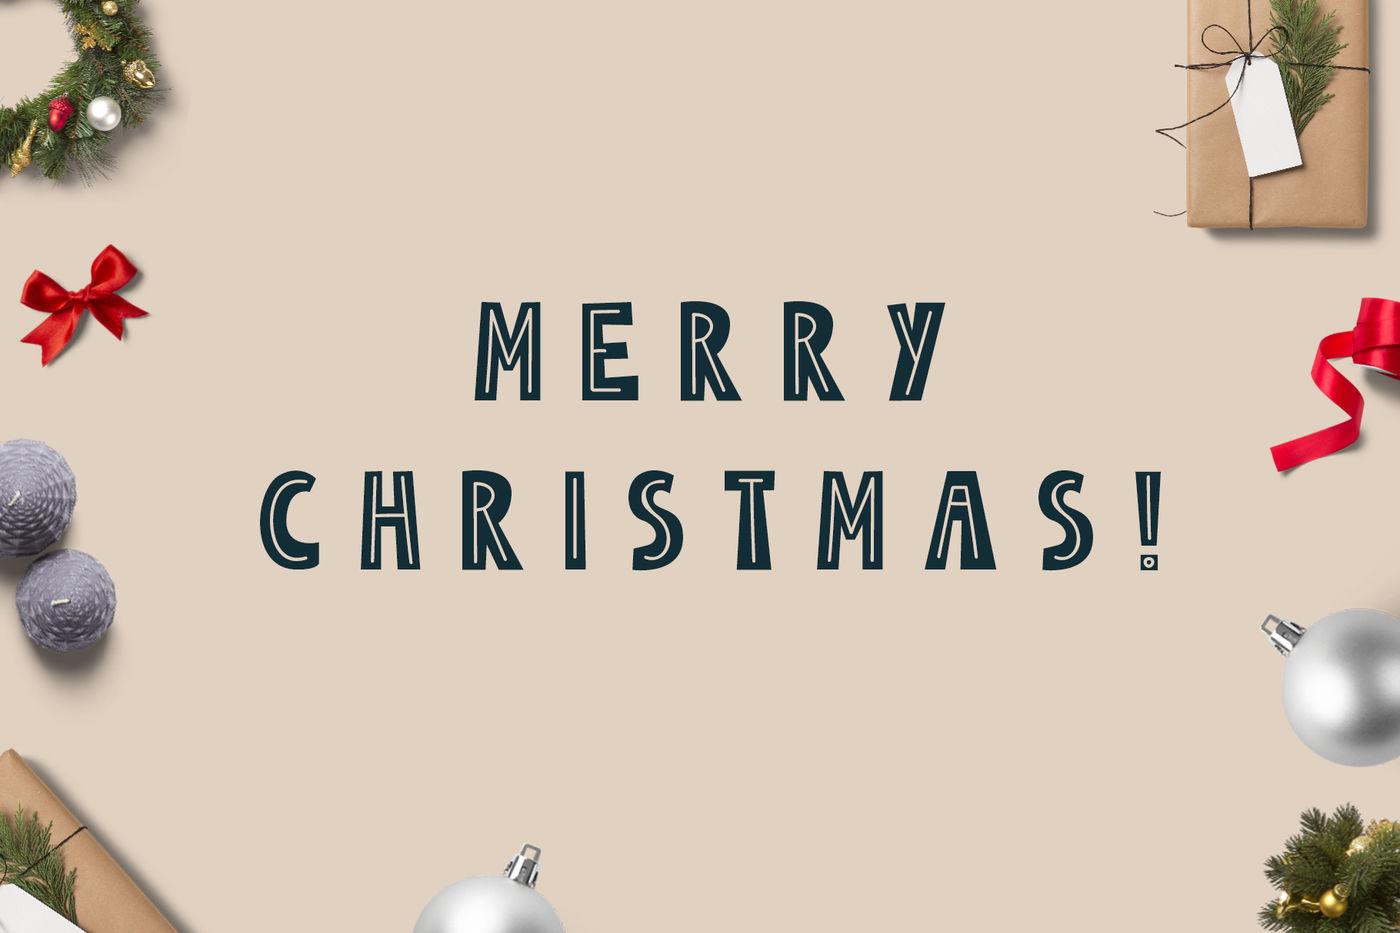 Merry Christmas Scandinavian Set By Juliya Kochkanyan